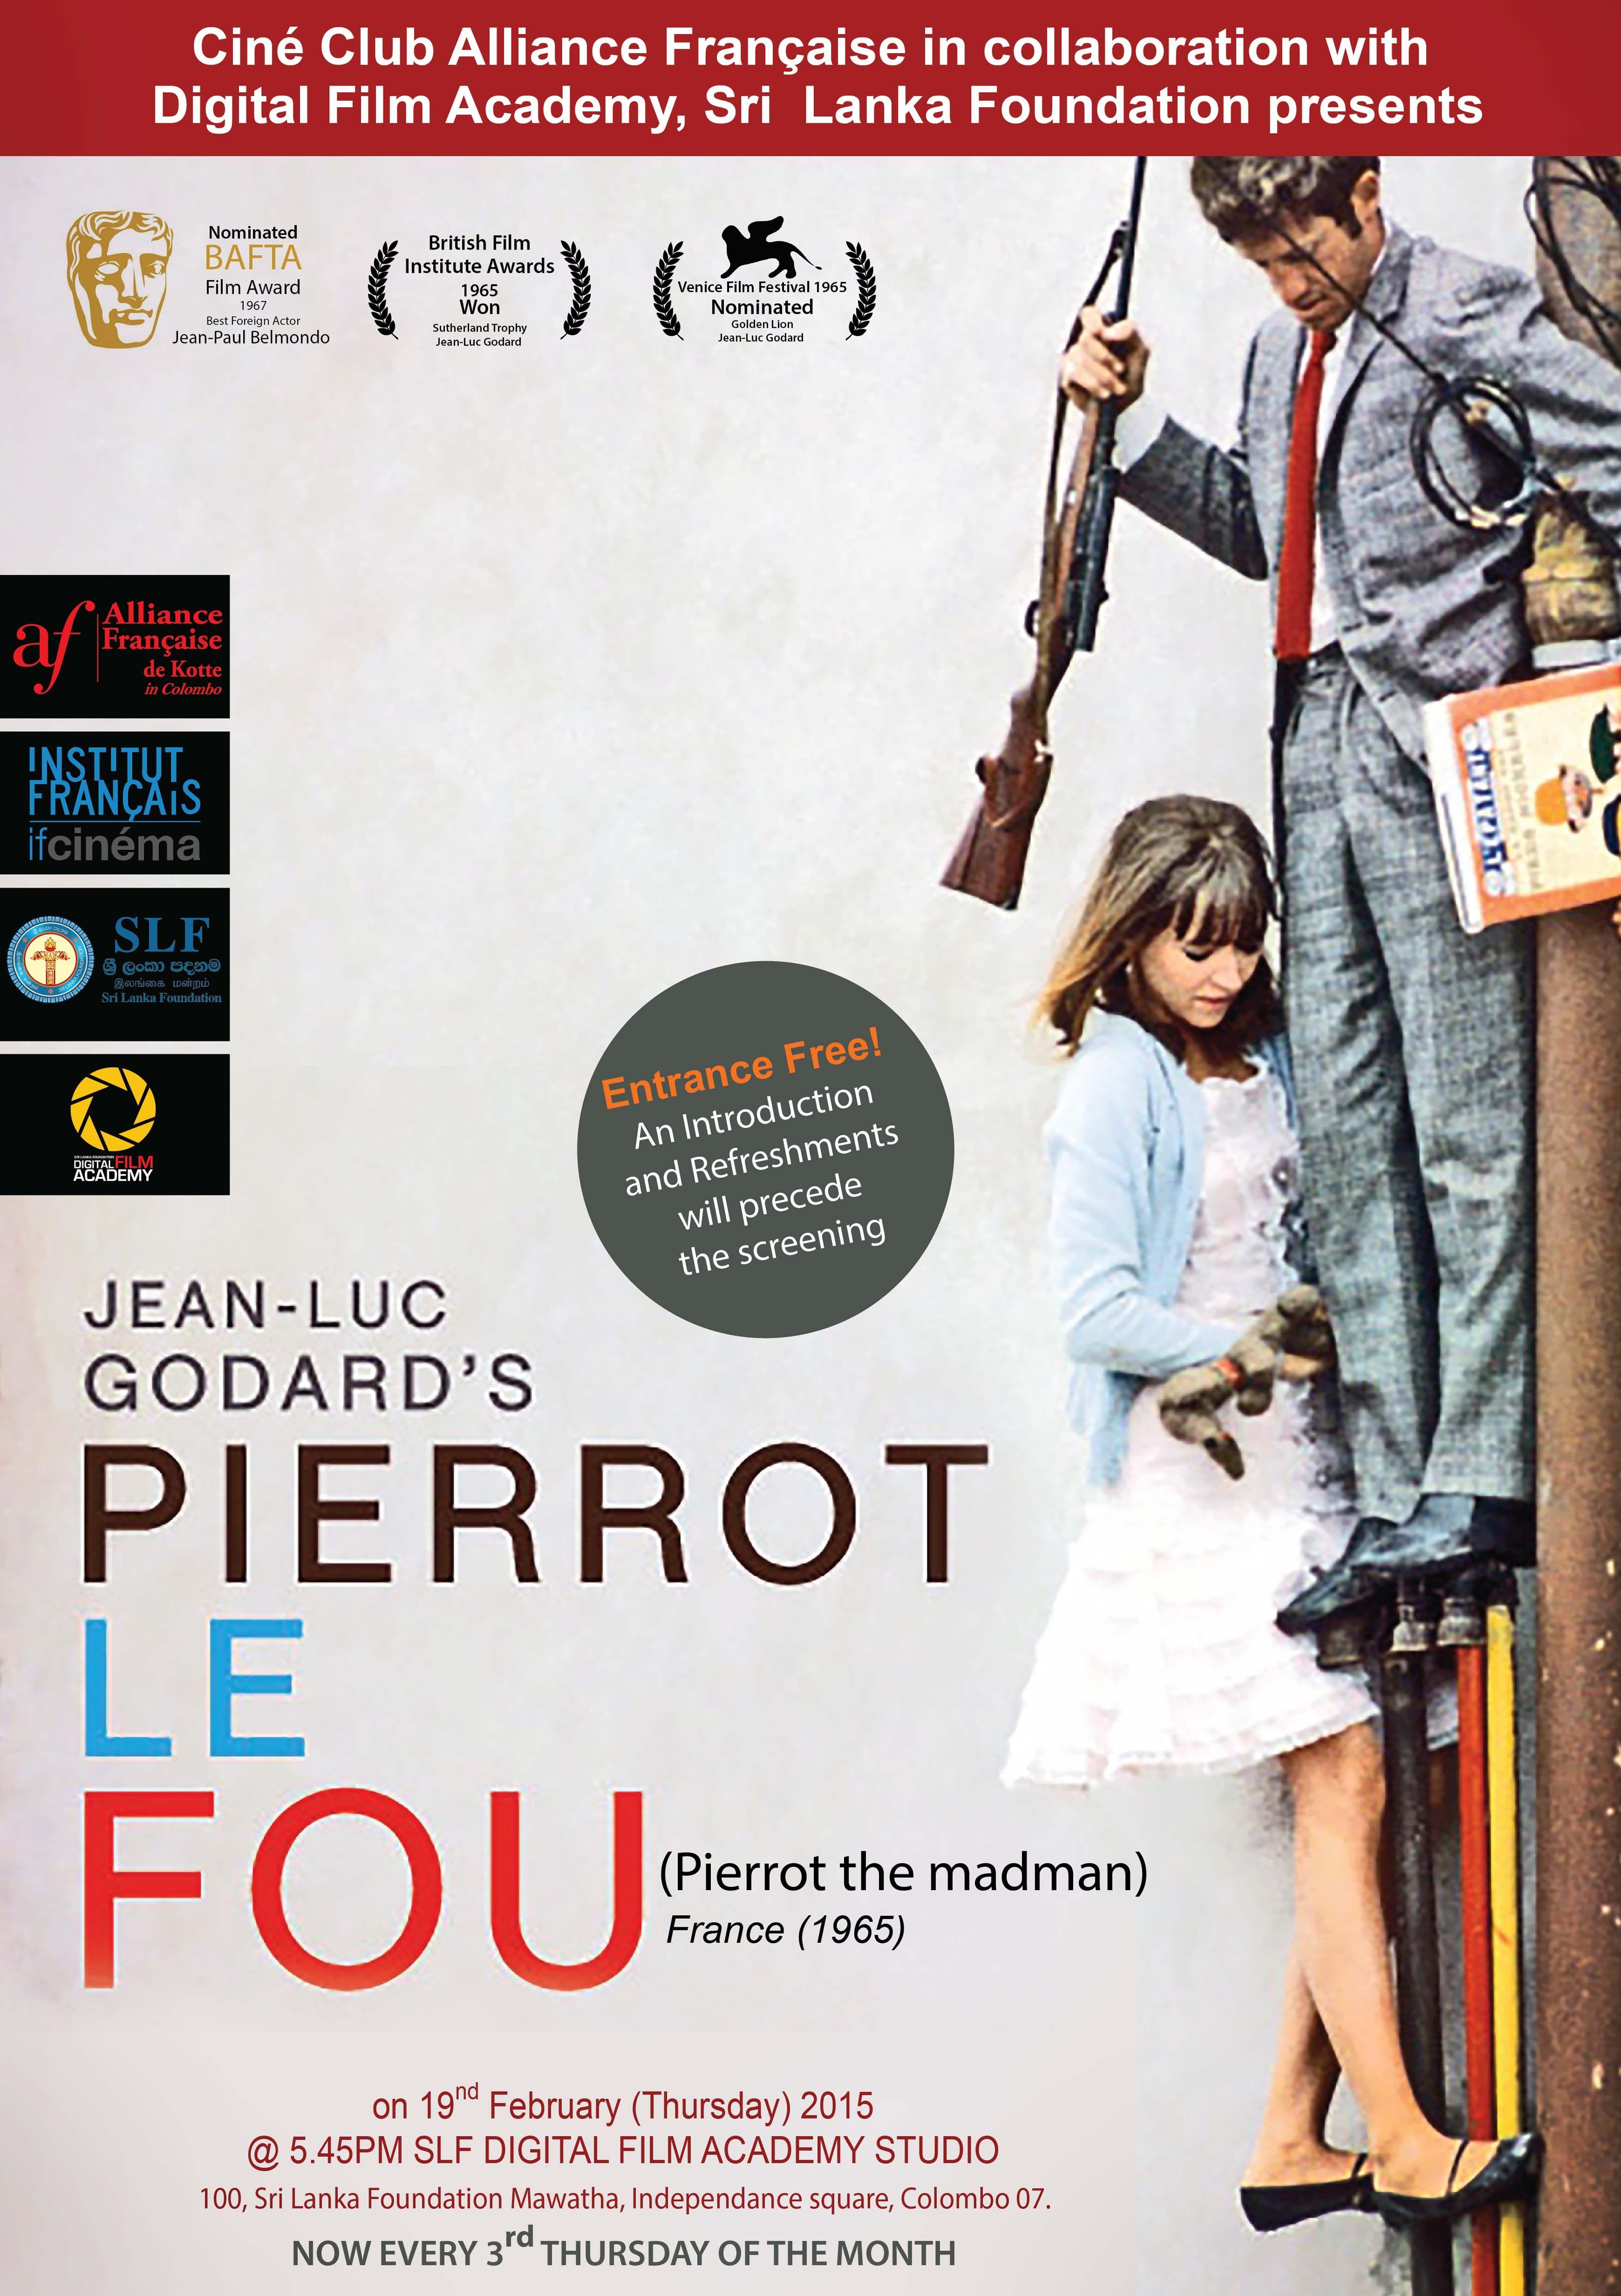 Pierrot le Fou 1965 FRENCH 1080p Bluray | ToRRENTiN\' • LiNks To ART ...